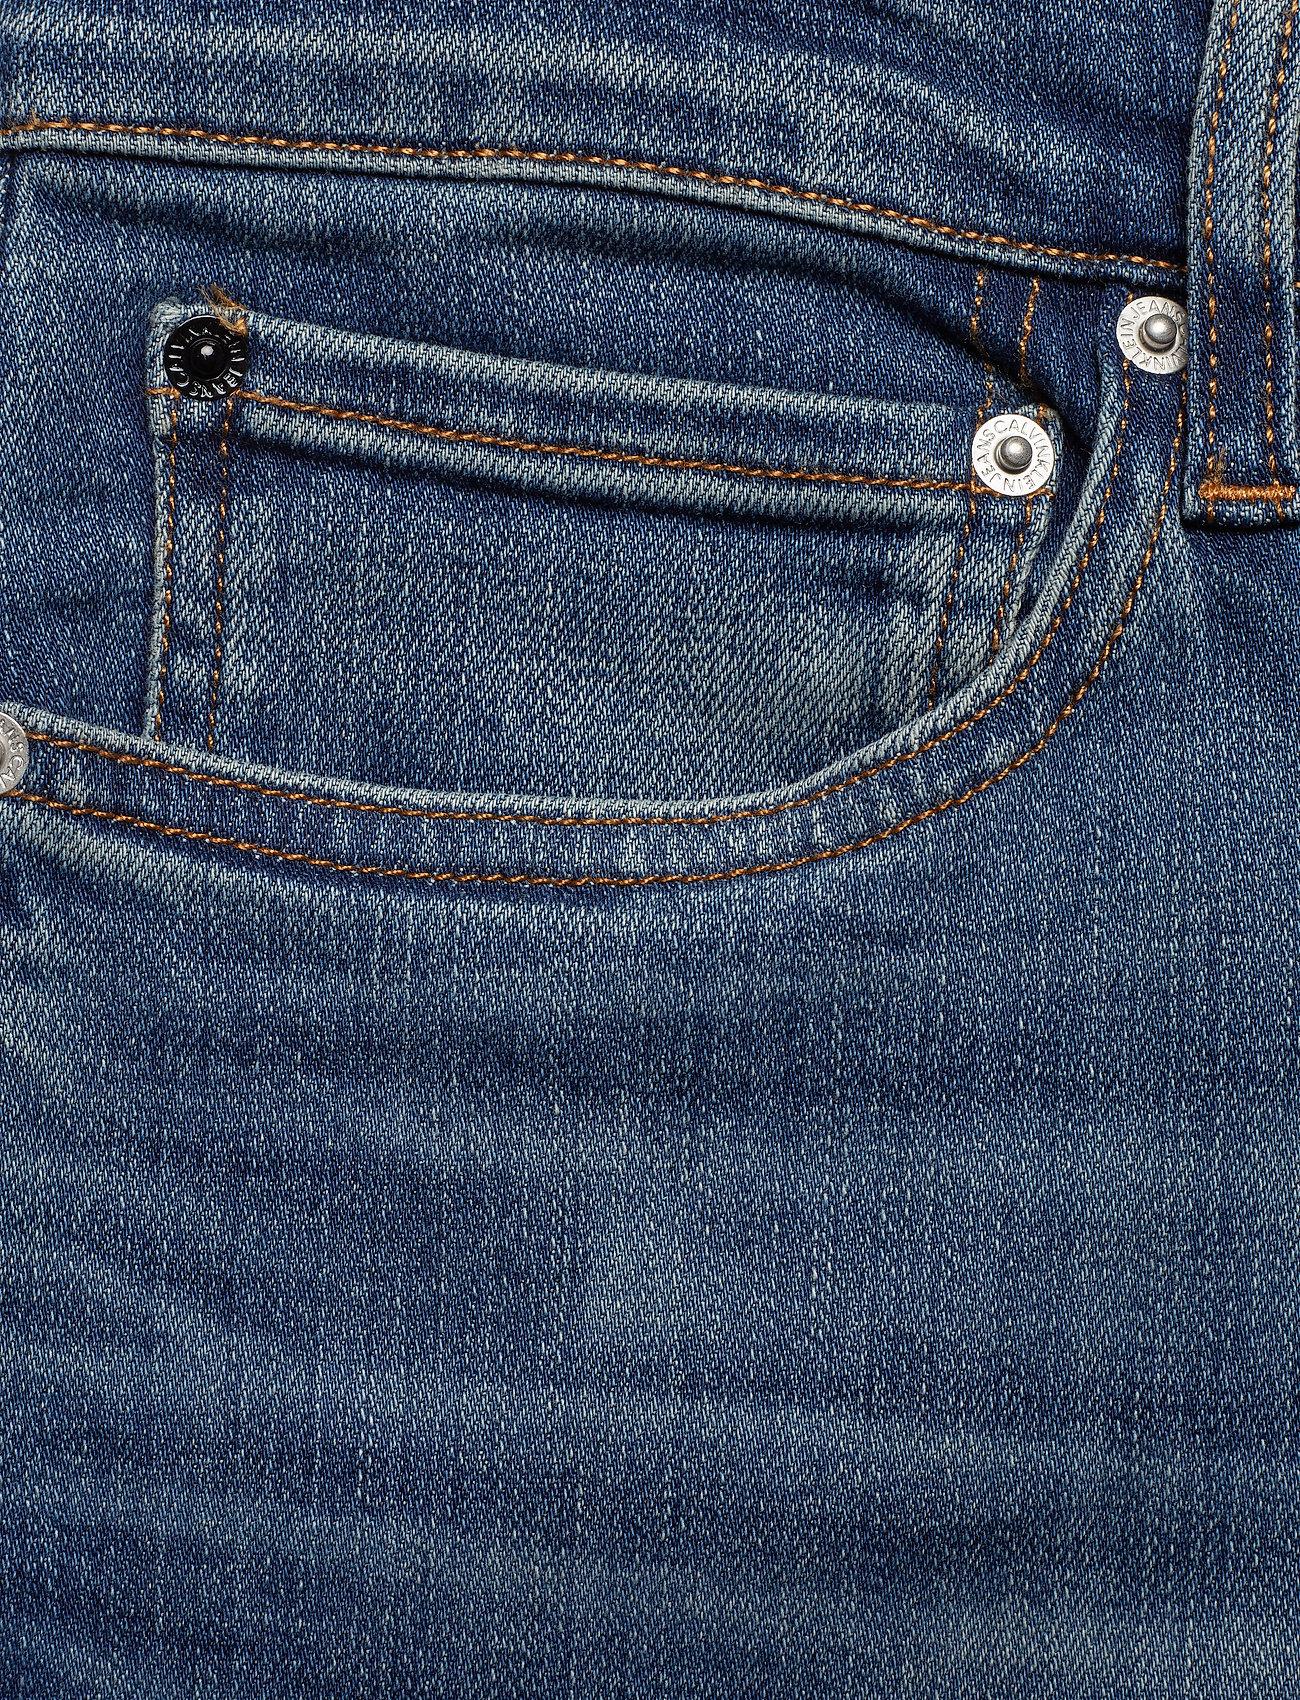 Klein Ckj Slimsacajawea Jeans BlueCalvin 026 lc51TuFK3J